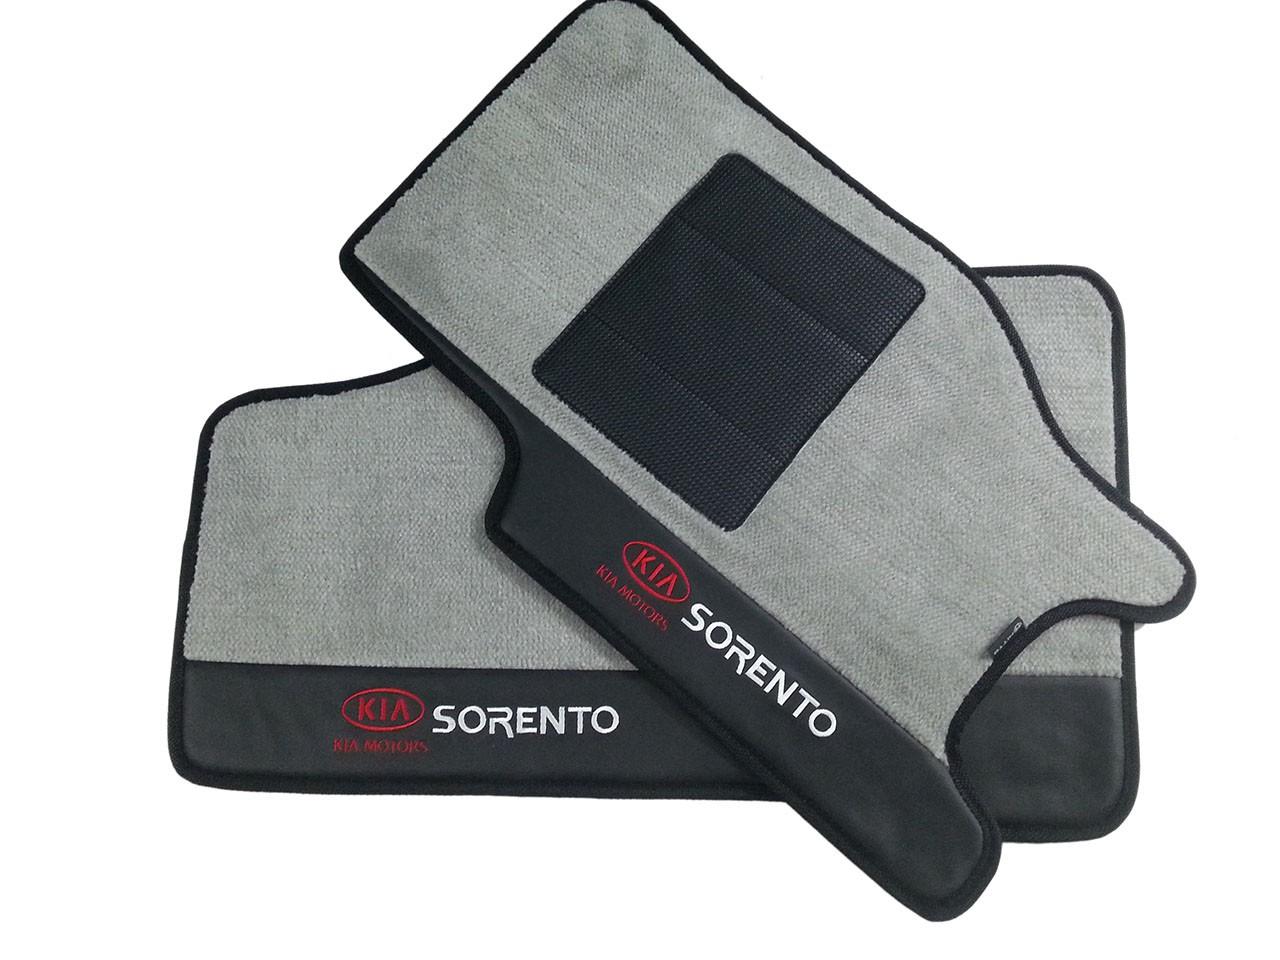 Tapete Carpete Sorento Kia, Premium Bouclê